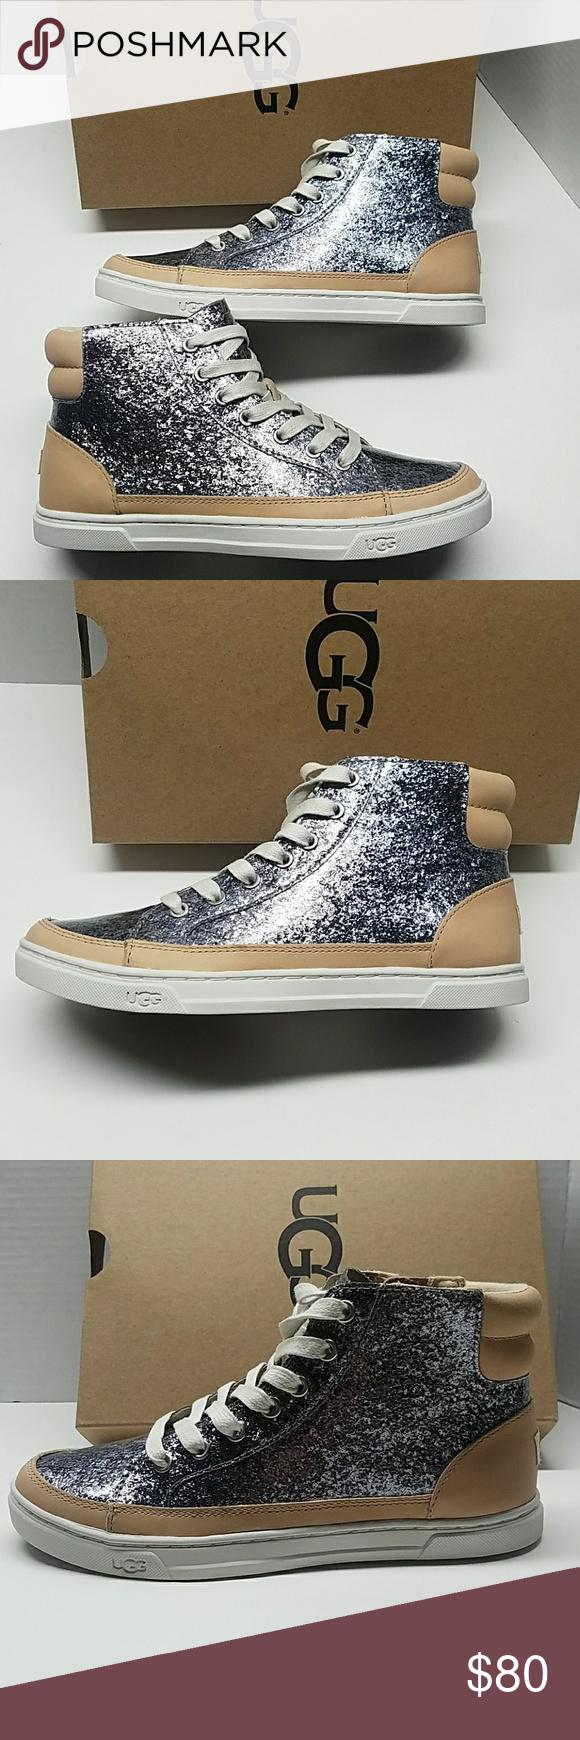 e71068ab3d9 UGG Gradie Glitter Gunmetal Hi-top Sneaker Shoes 5 UGG Gradie ...